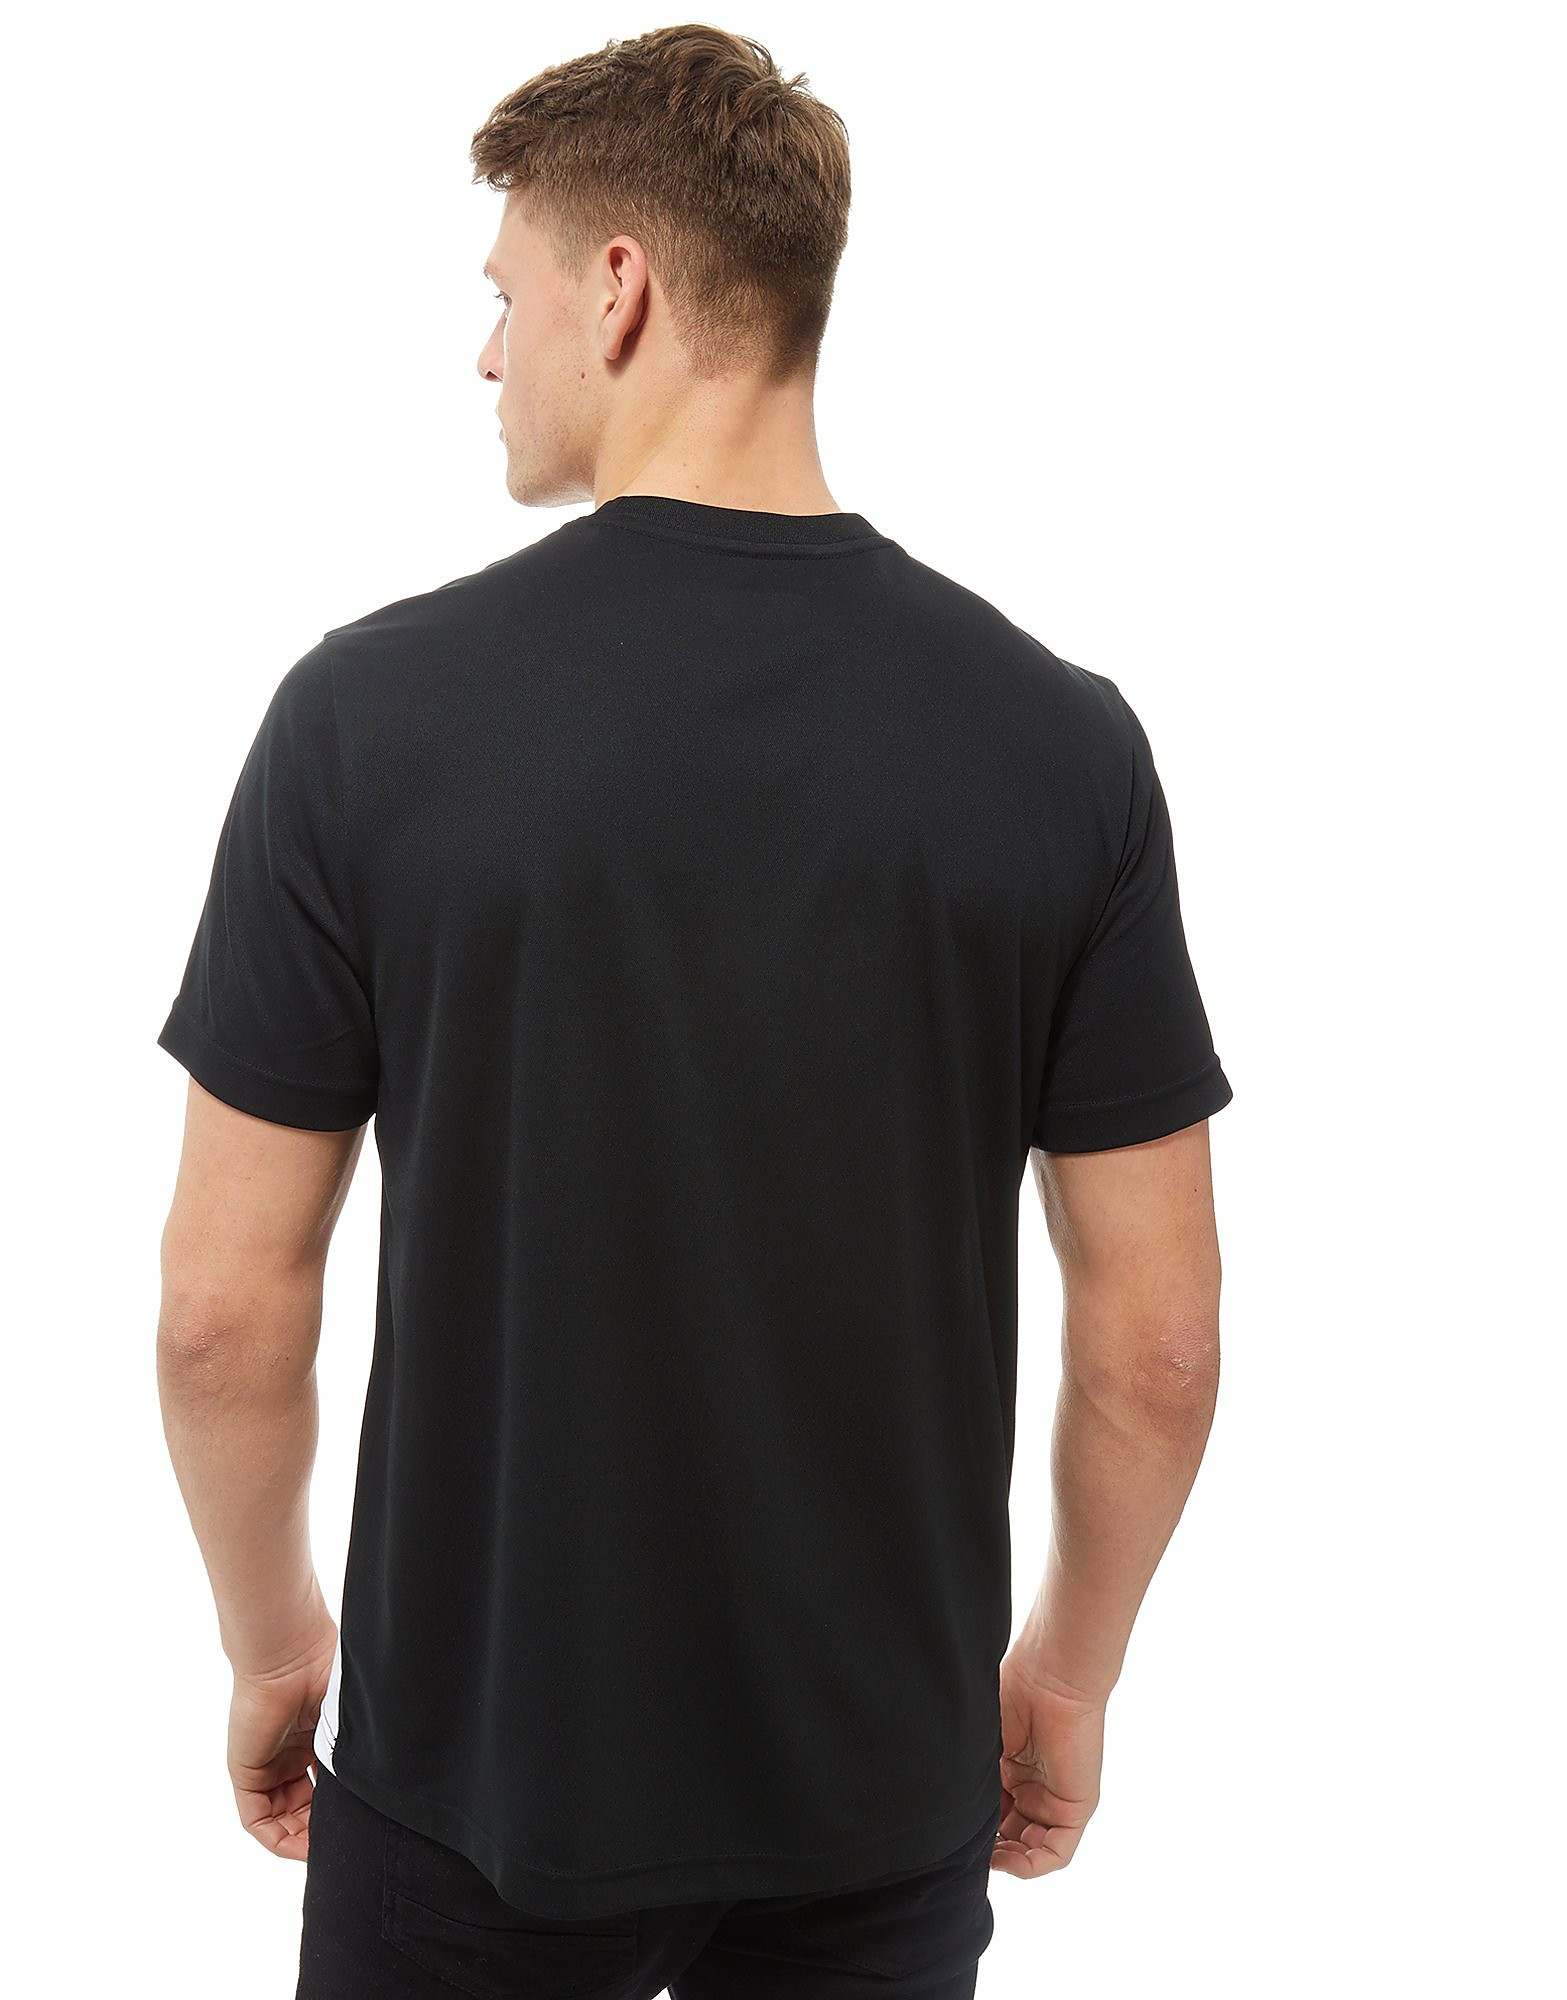 Lacoste Colourblock Line Short Sleeve T-Shirt